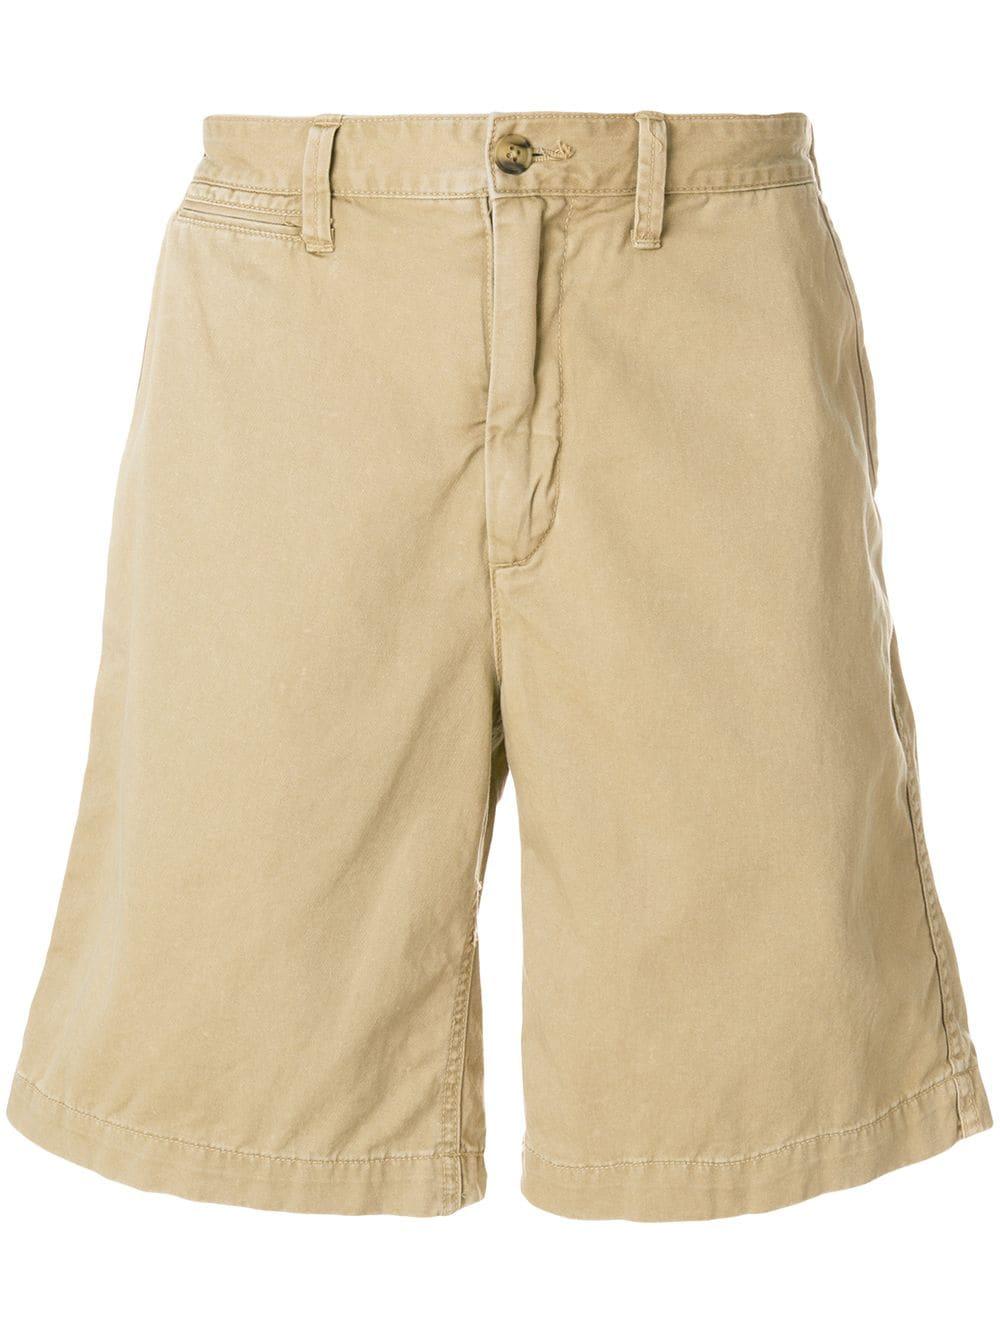 Polo Ralph Lauren Chino-Shorts mit schmaler Passform - Nude